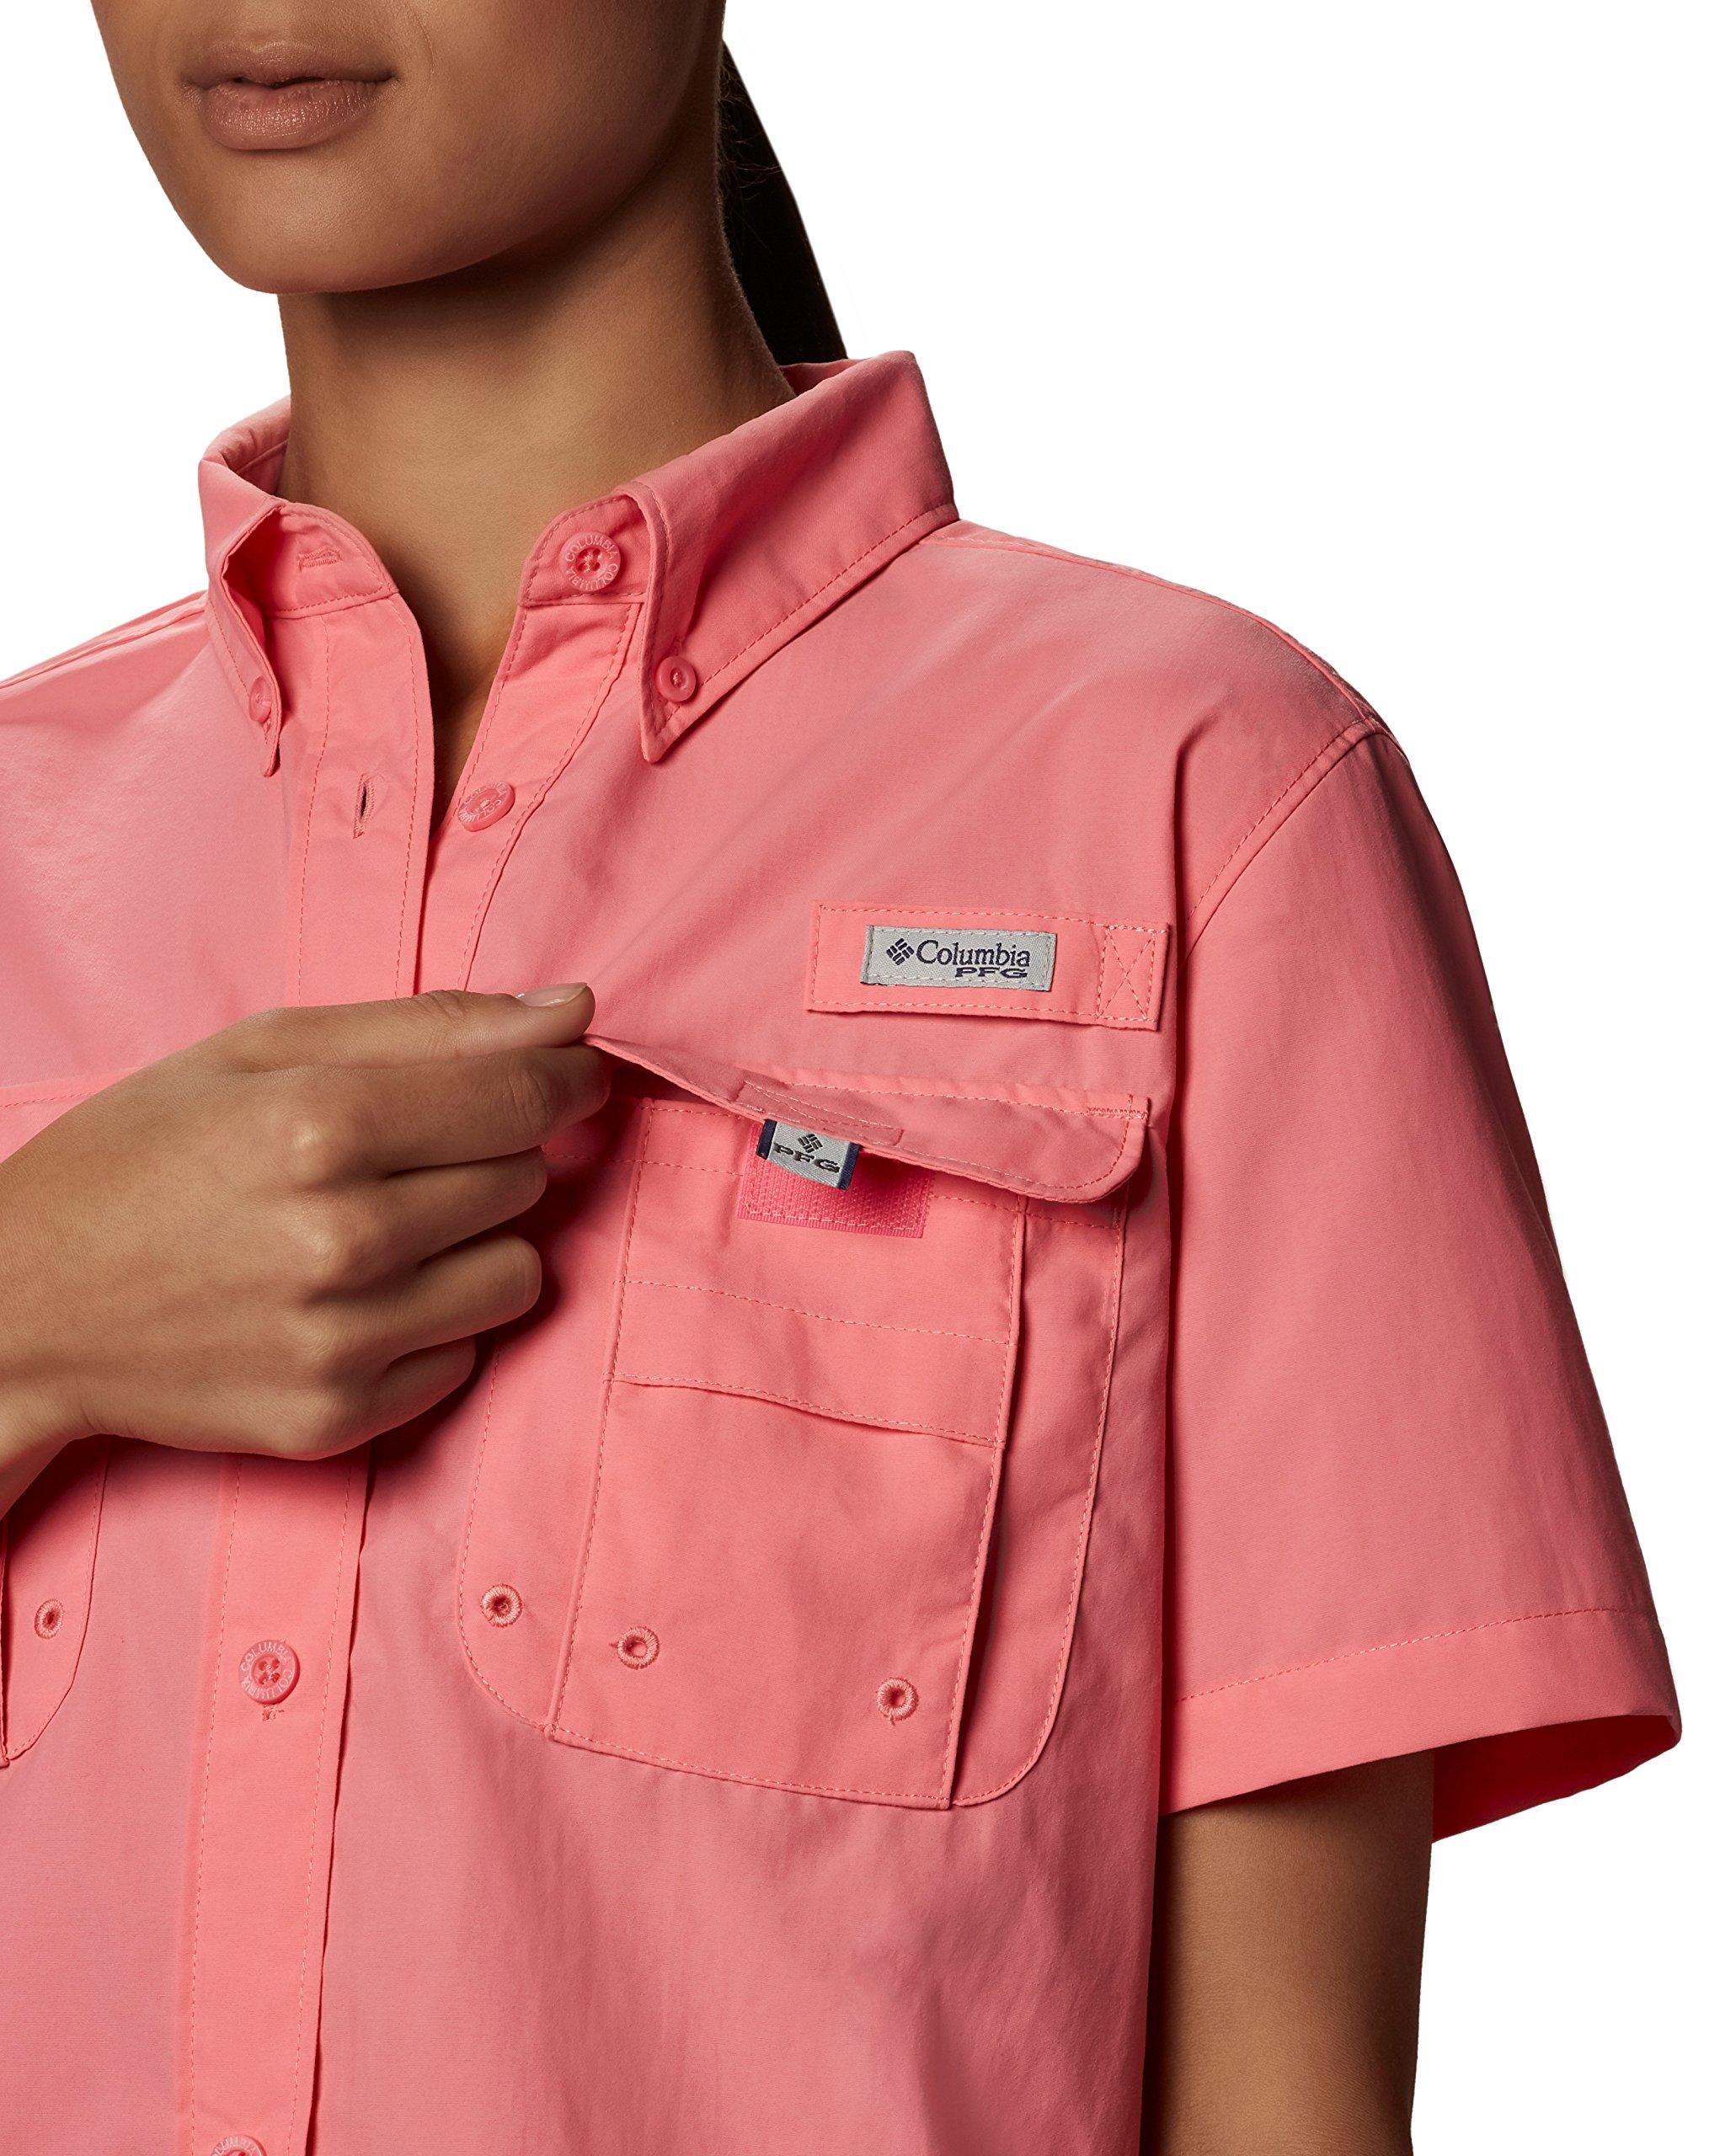 Columbia Women's Bahama Short Sleeve, Lollipop, X-Large by Columbia (Image #4)